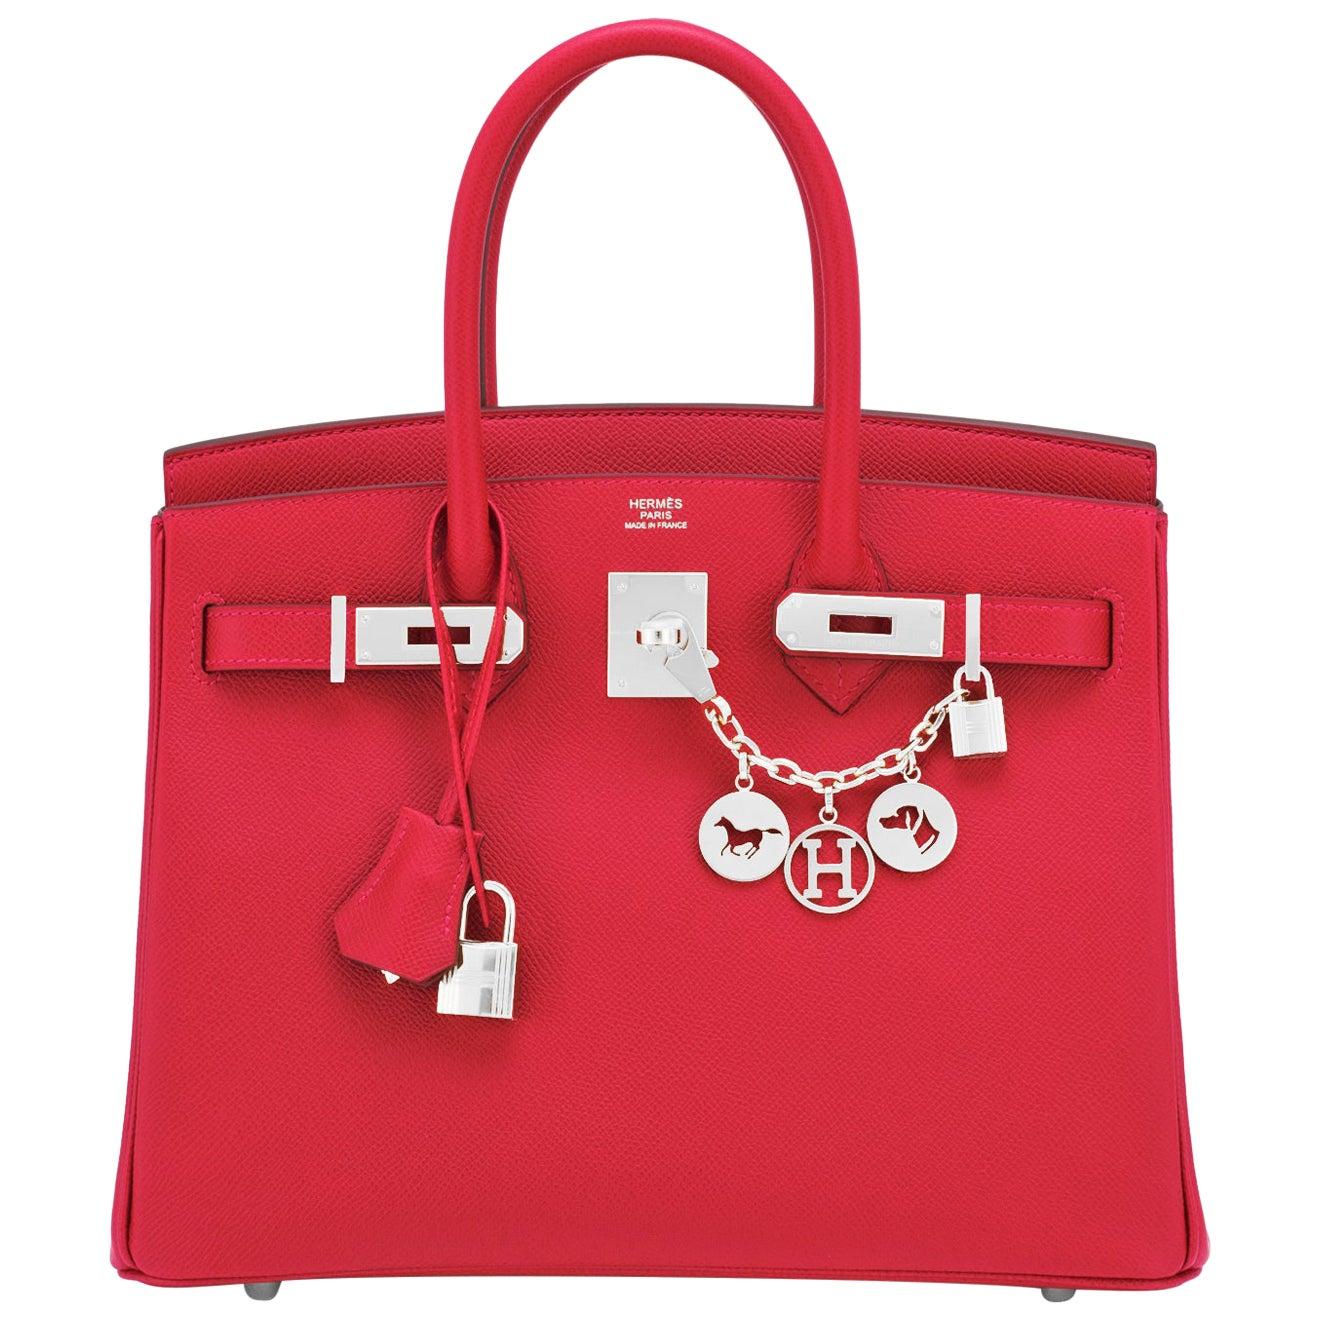 Hermes Birkin 30 Rouge de Coeur Lipstick Red Epsom Palladium Bag Y Stamp, 2020